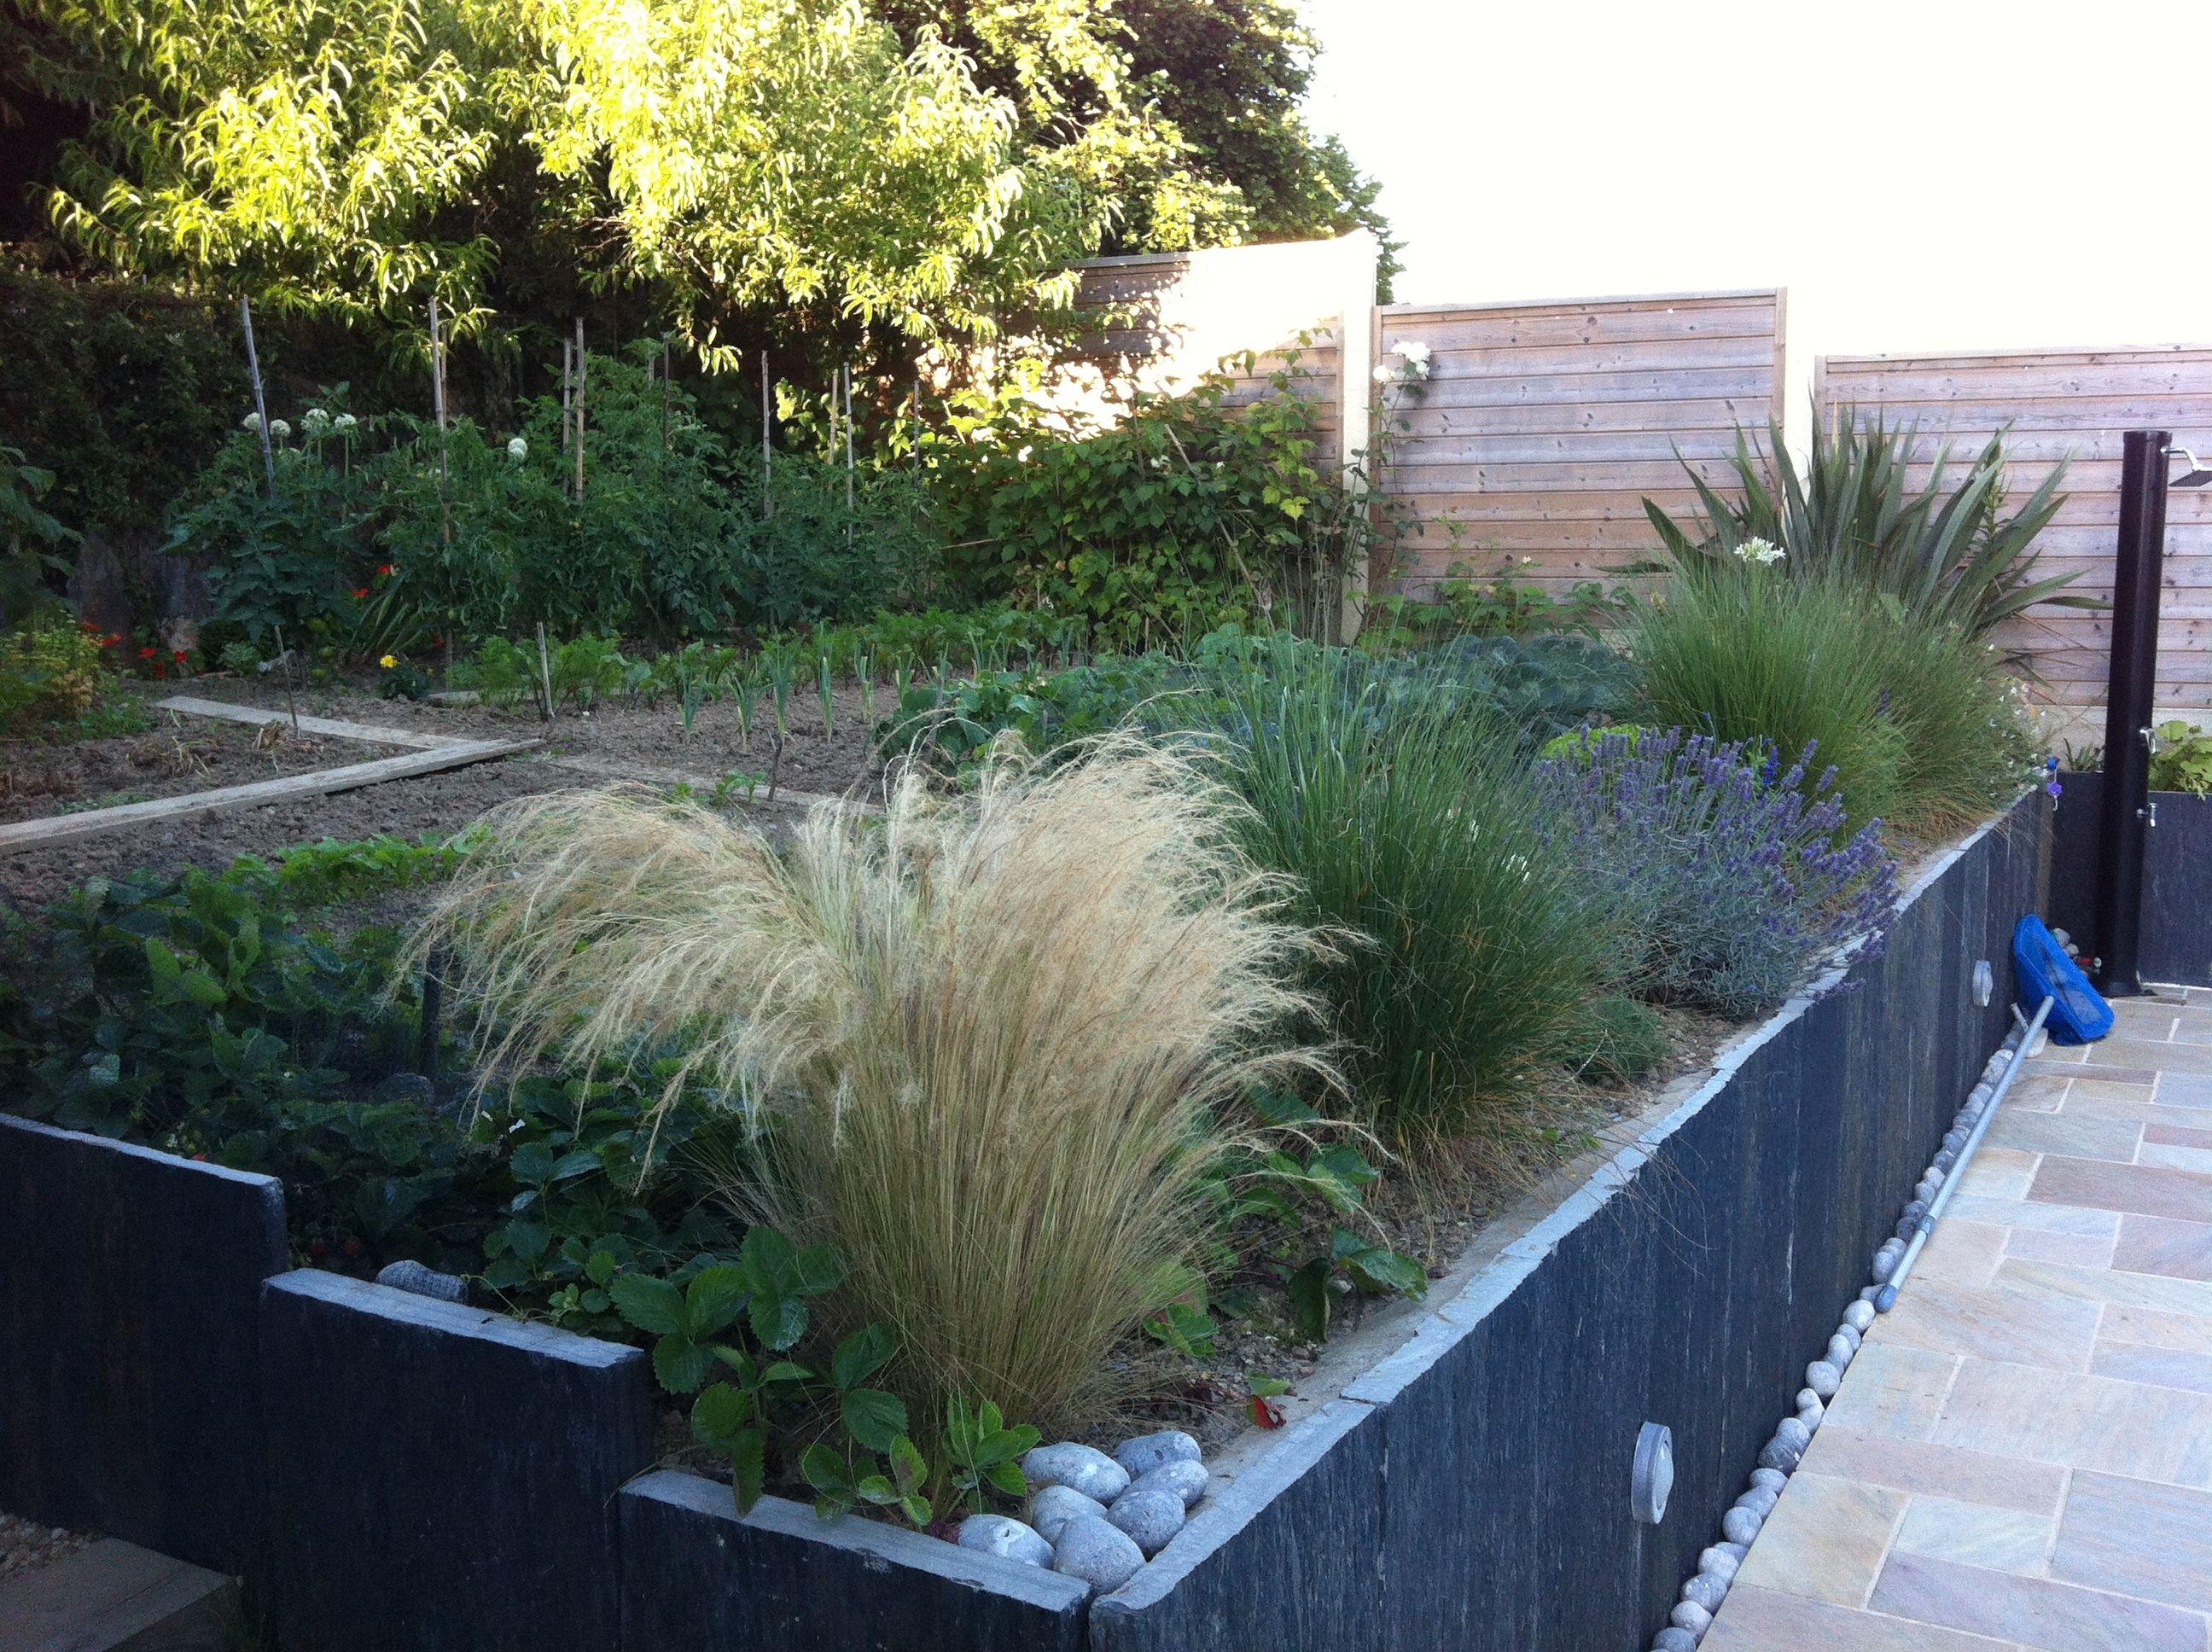 217f0dd7b9739d67a41a0adae0dadc33 Meilleur De De Idee Deco Jardin Conception